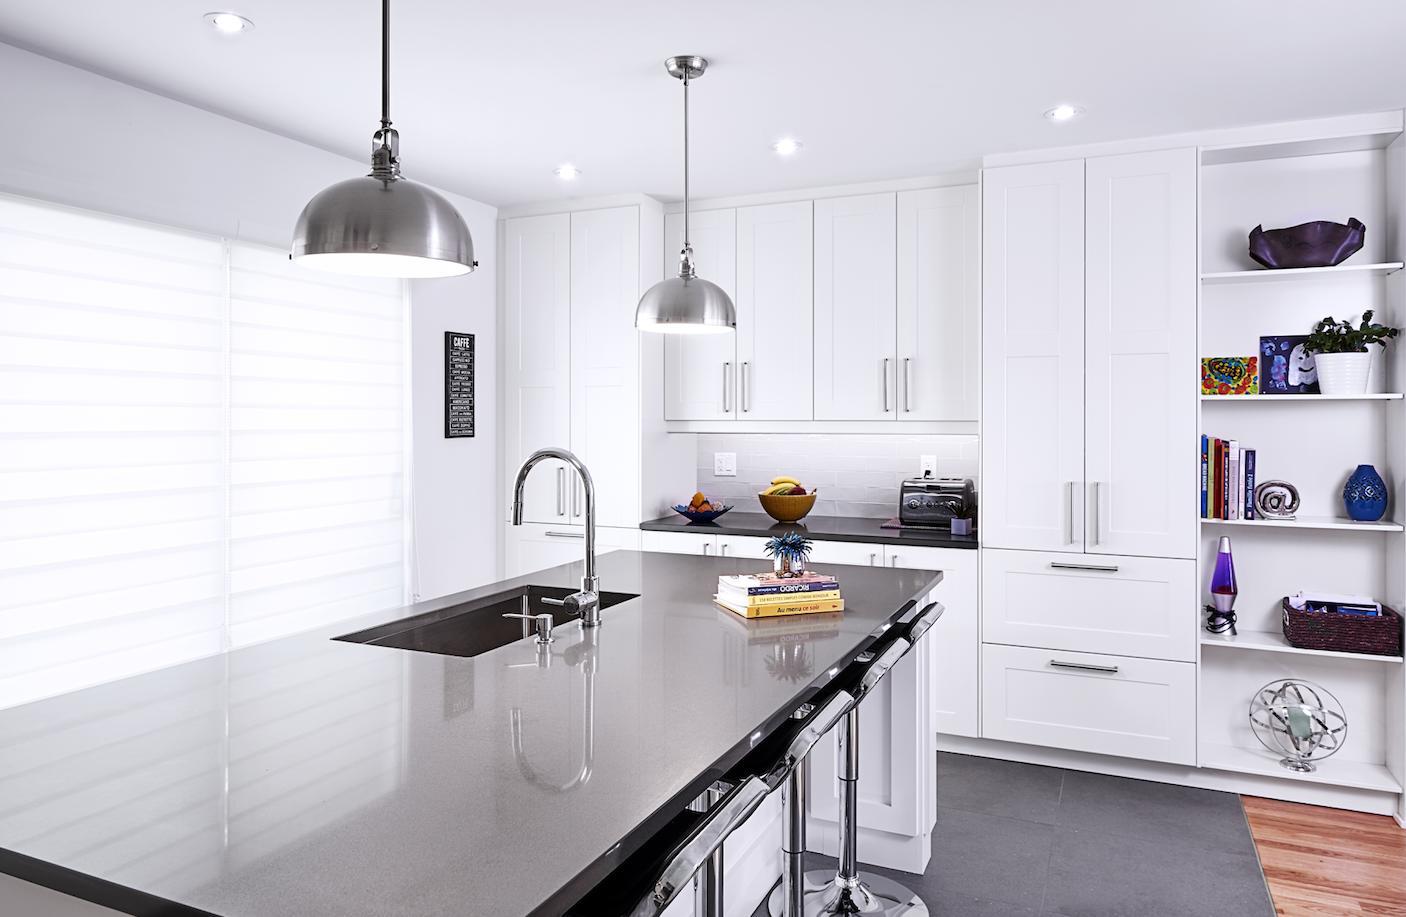 homewise-innovations-sylvio-kitchen-renovations-toronto2